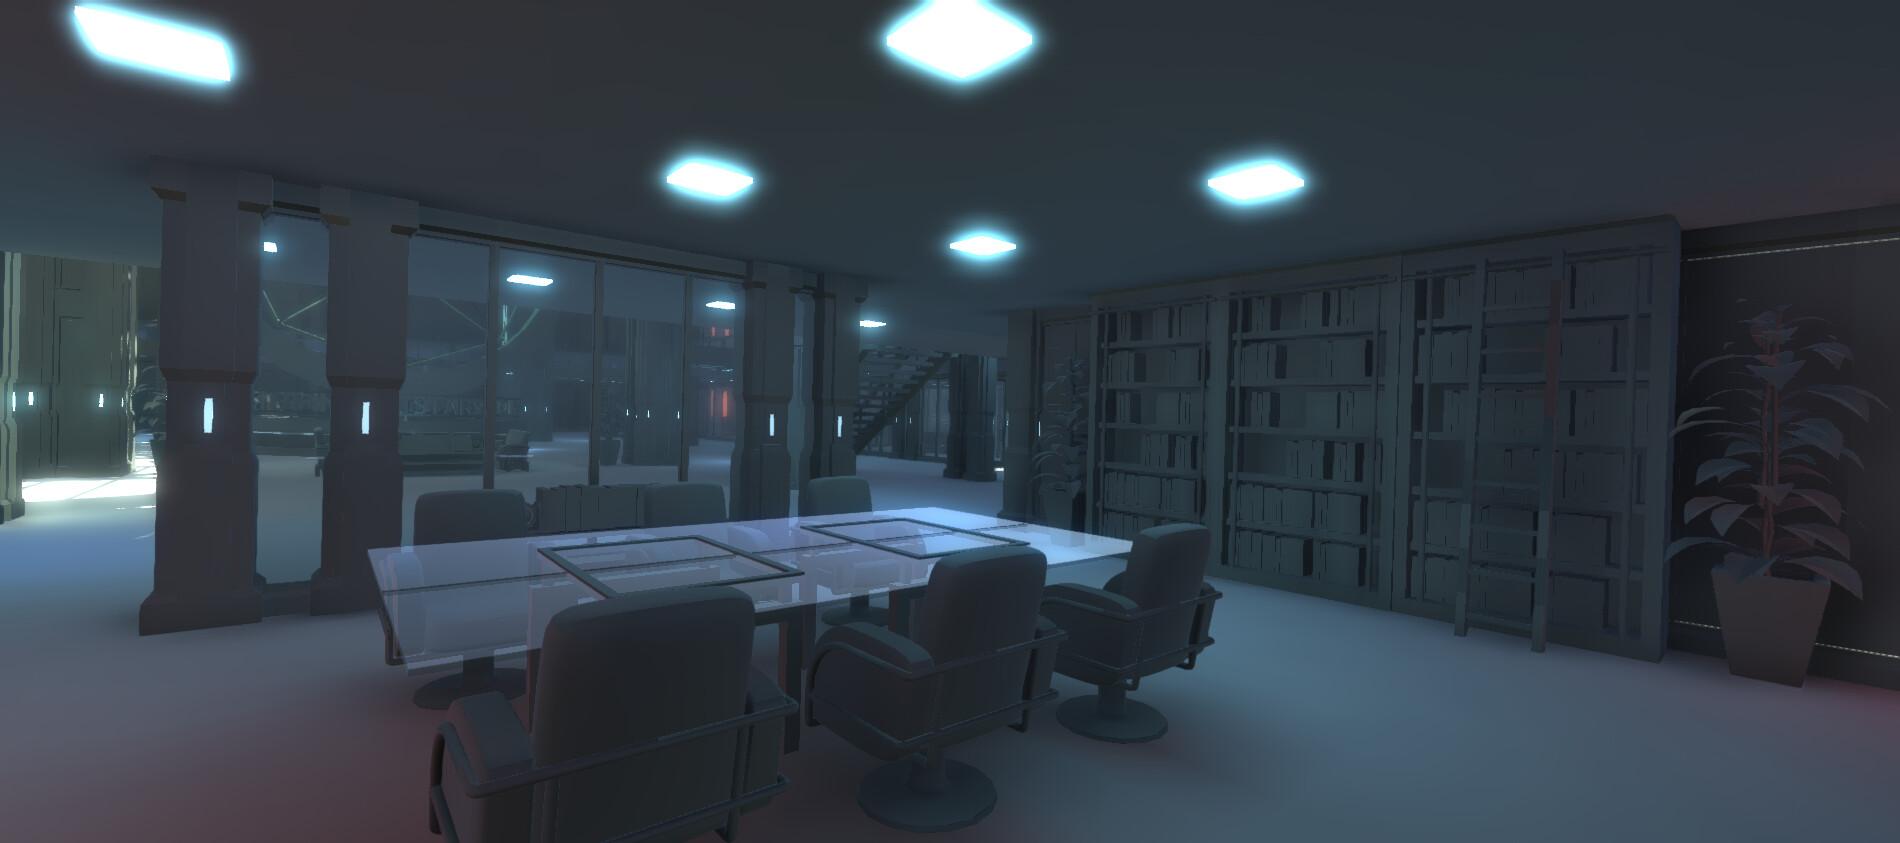 Christopher miller lab layout 07